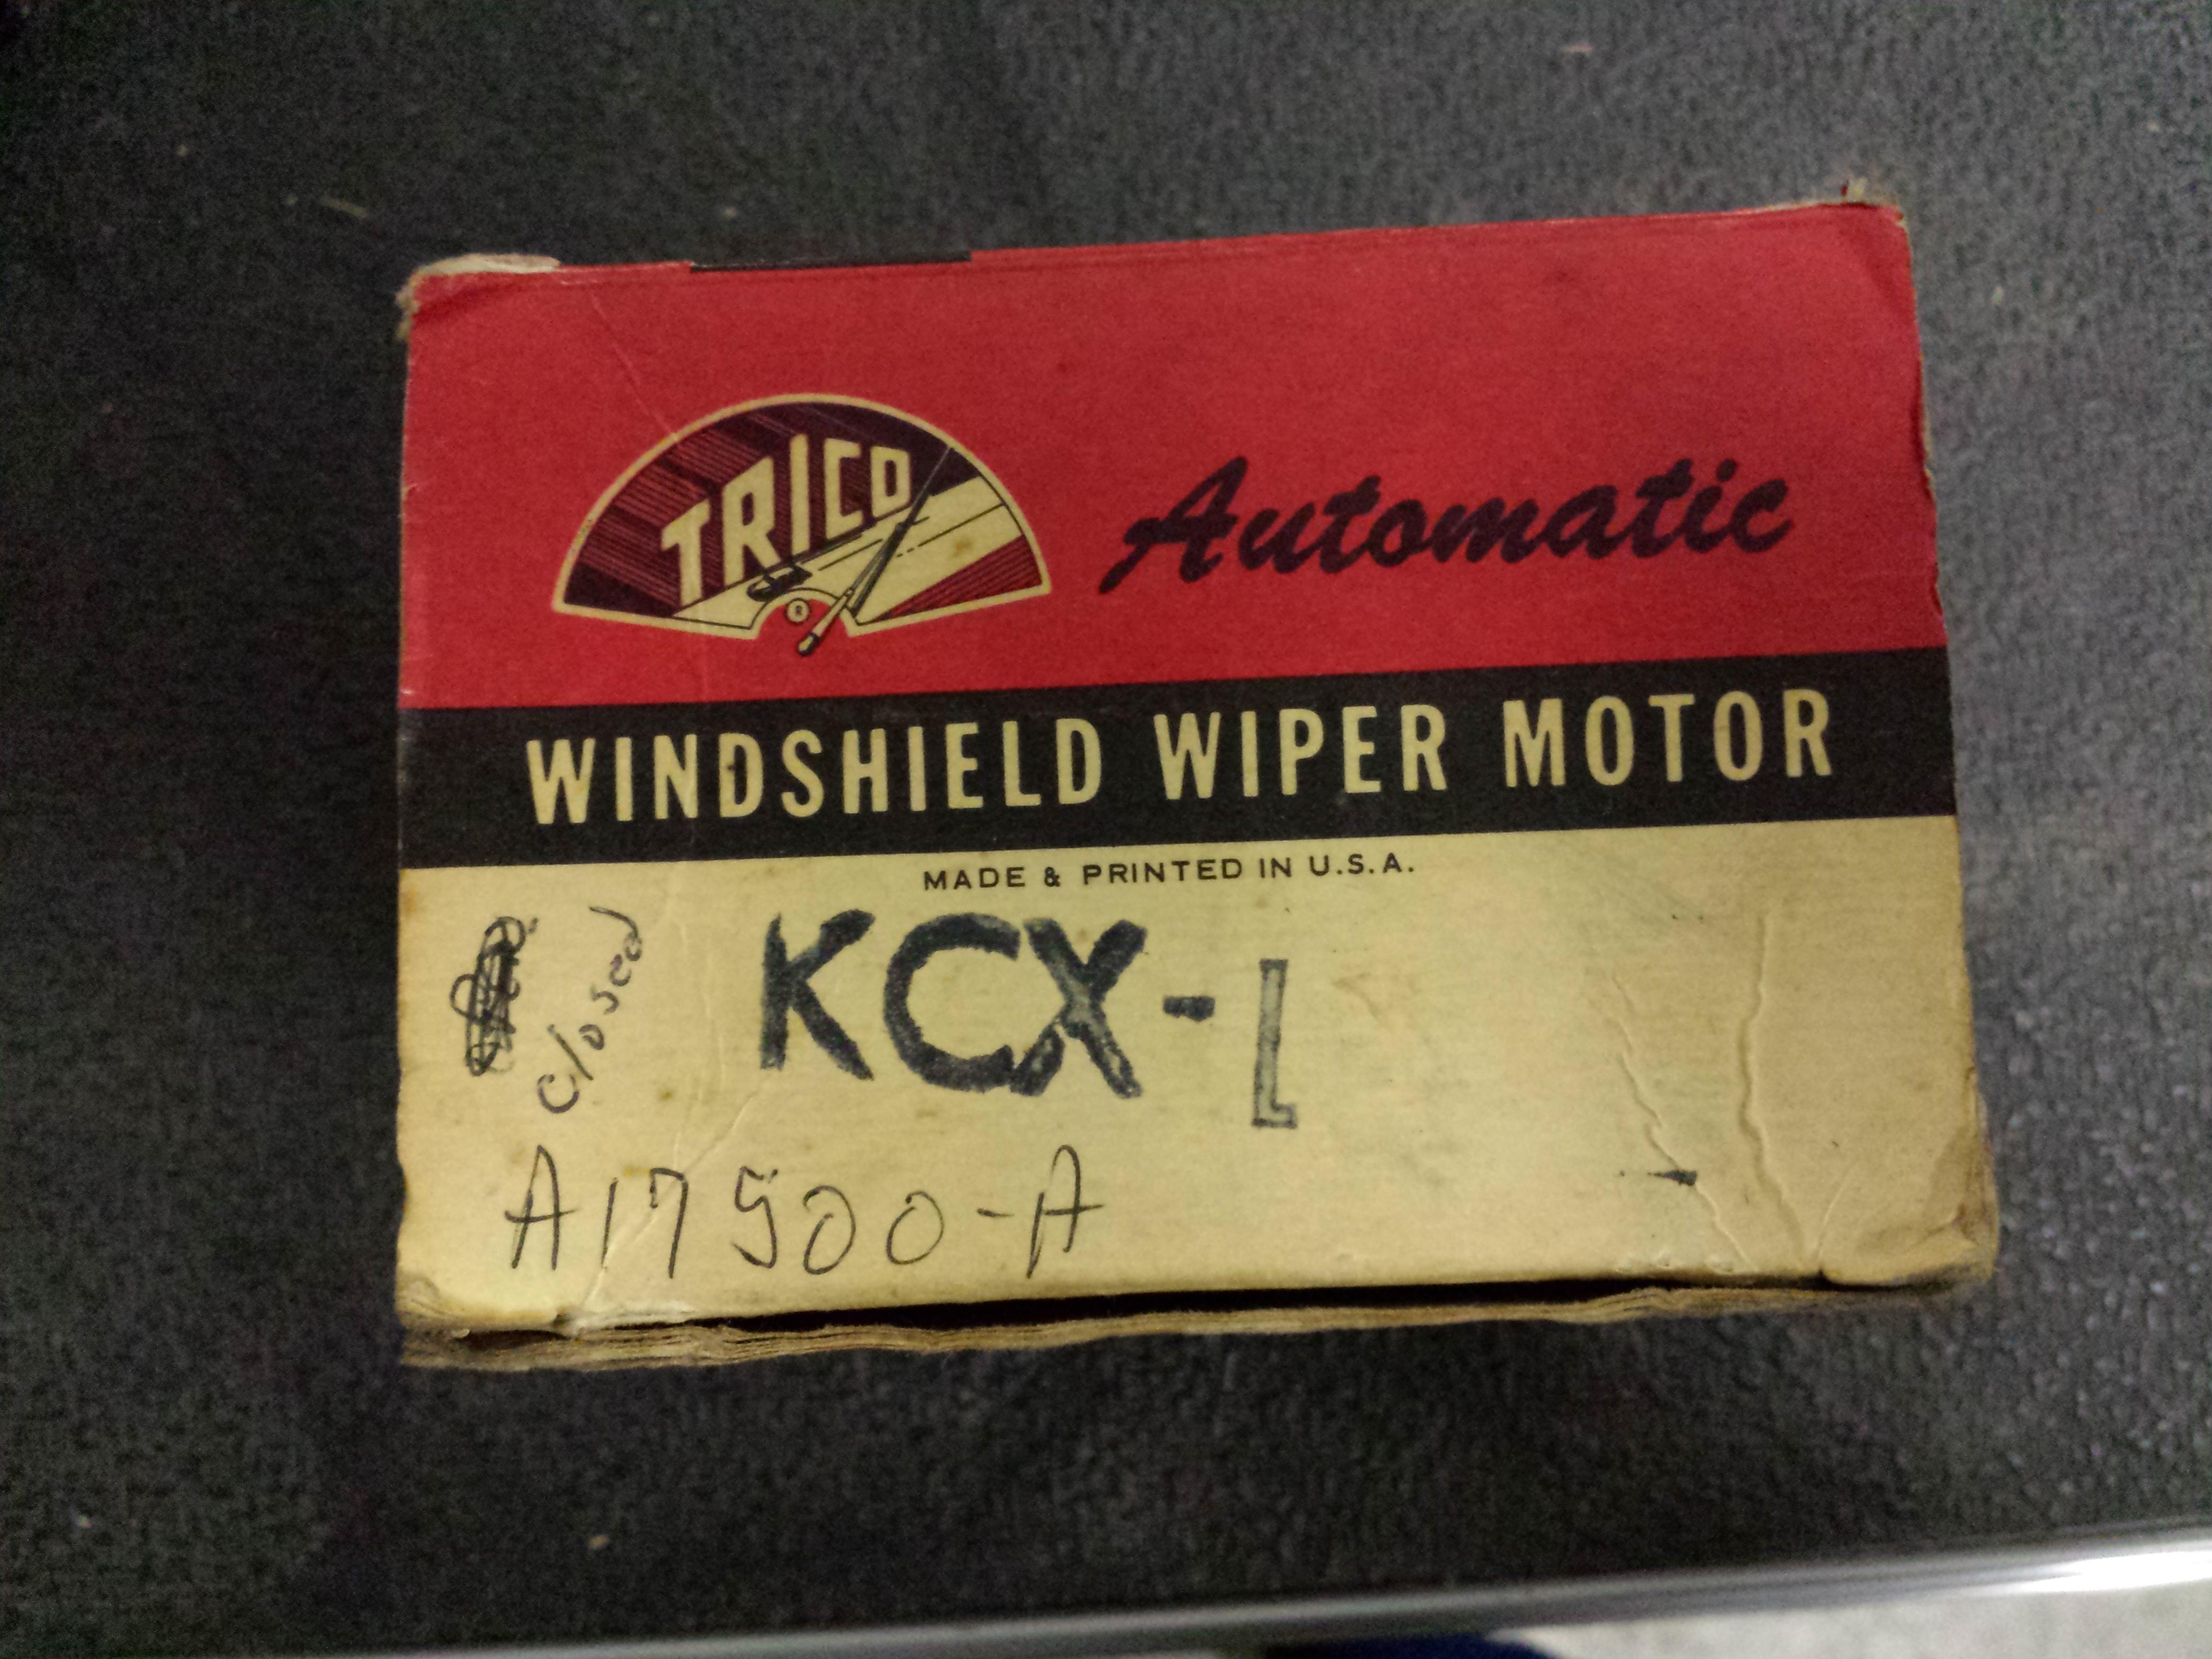 NOS KCX-1 Trico Wiper Motor